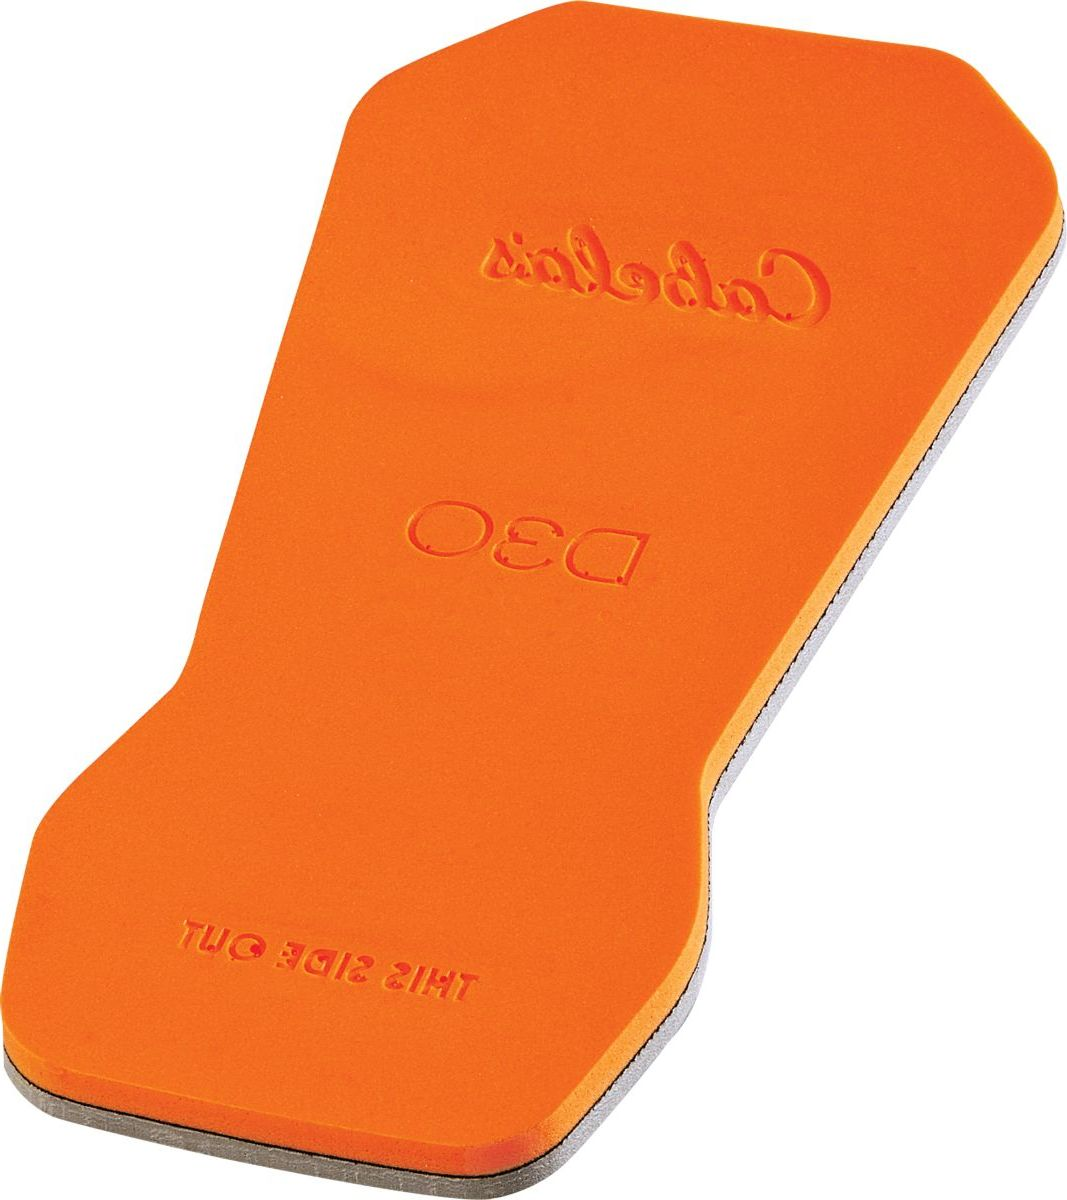 Cabela's D3O® Range Recoil Pad